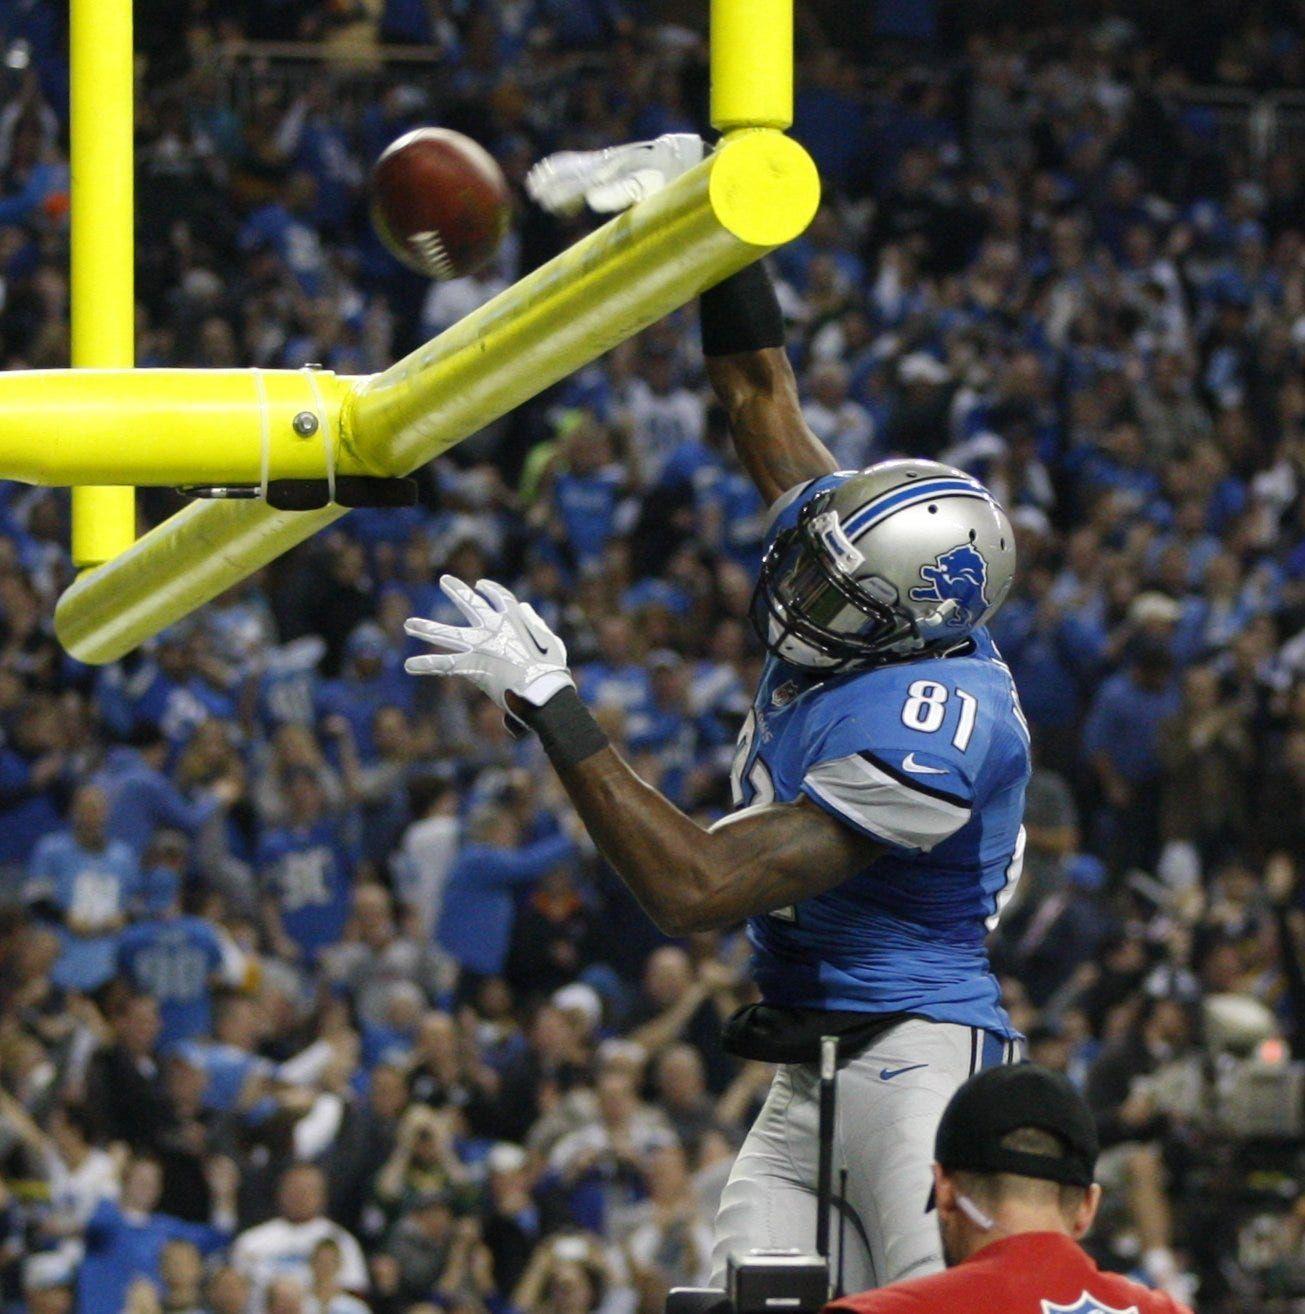 Calvin Johnson to Detroit Lions 'Put that money back in